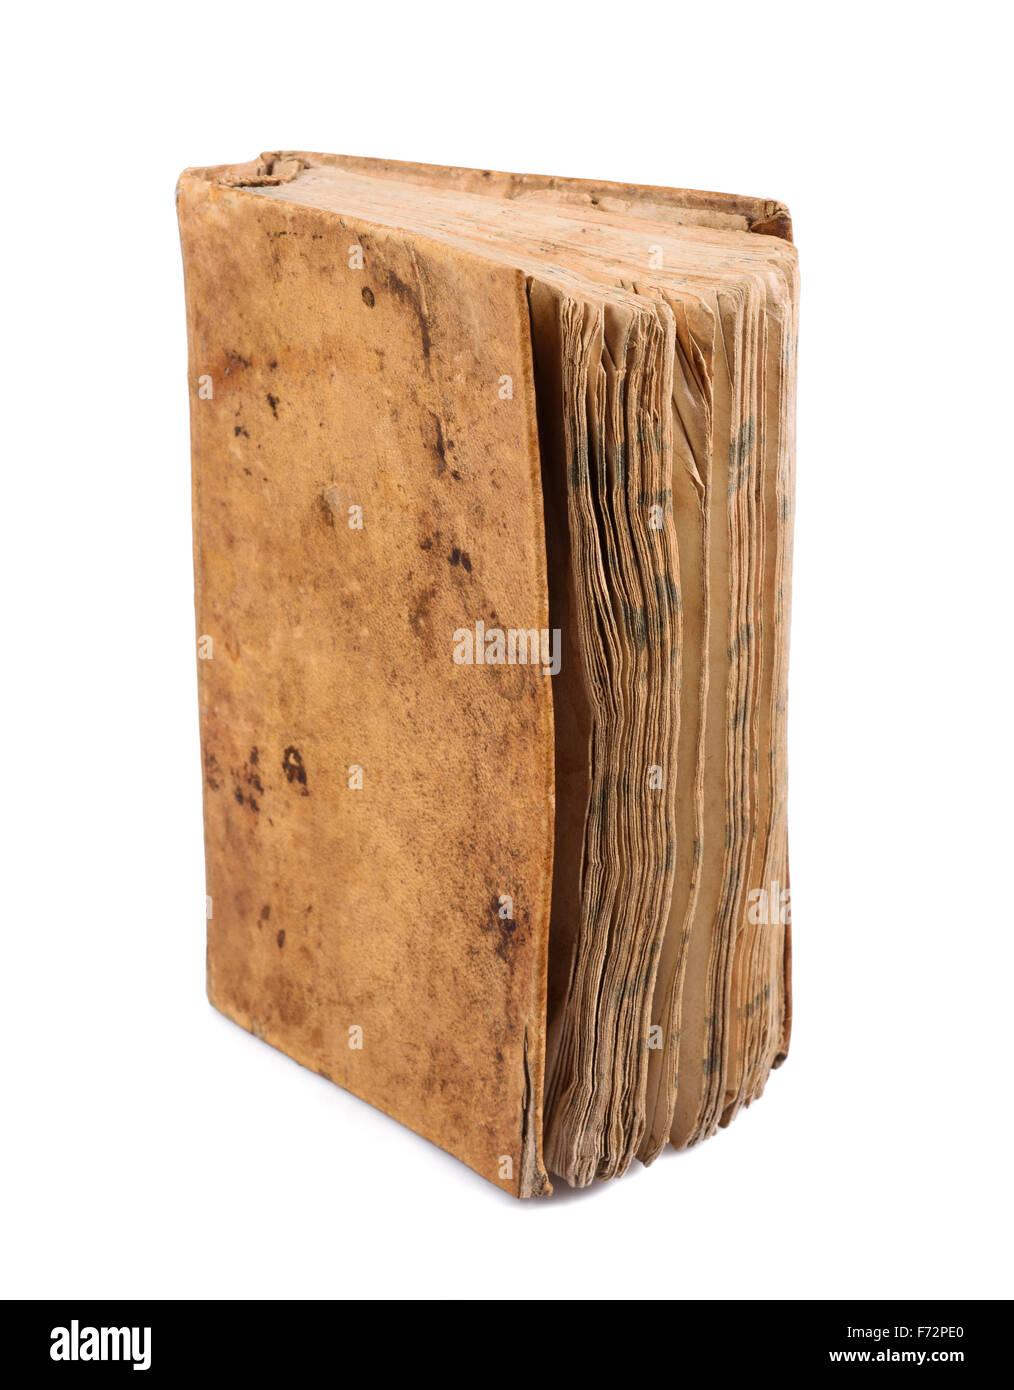 Libro viejo aislado sobre fondo blanco. Foto de stock